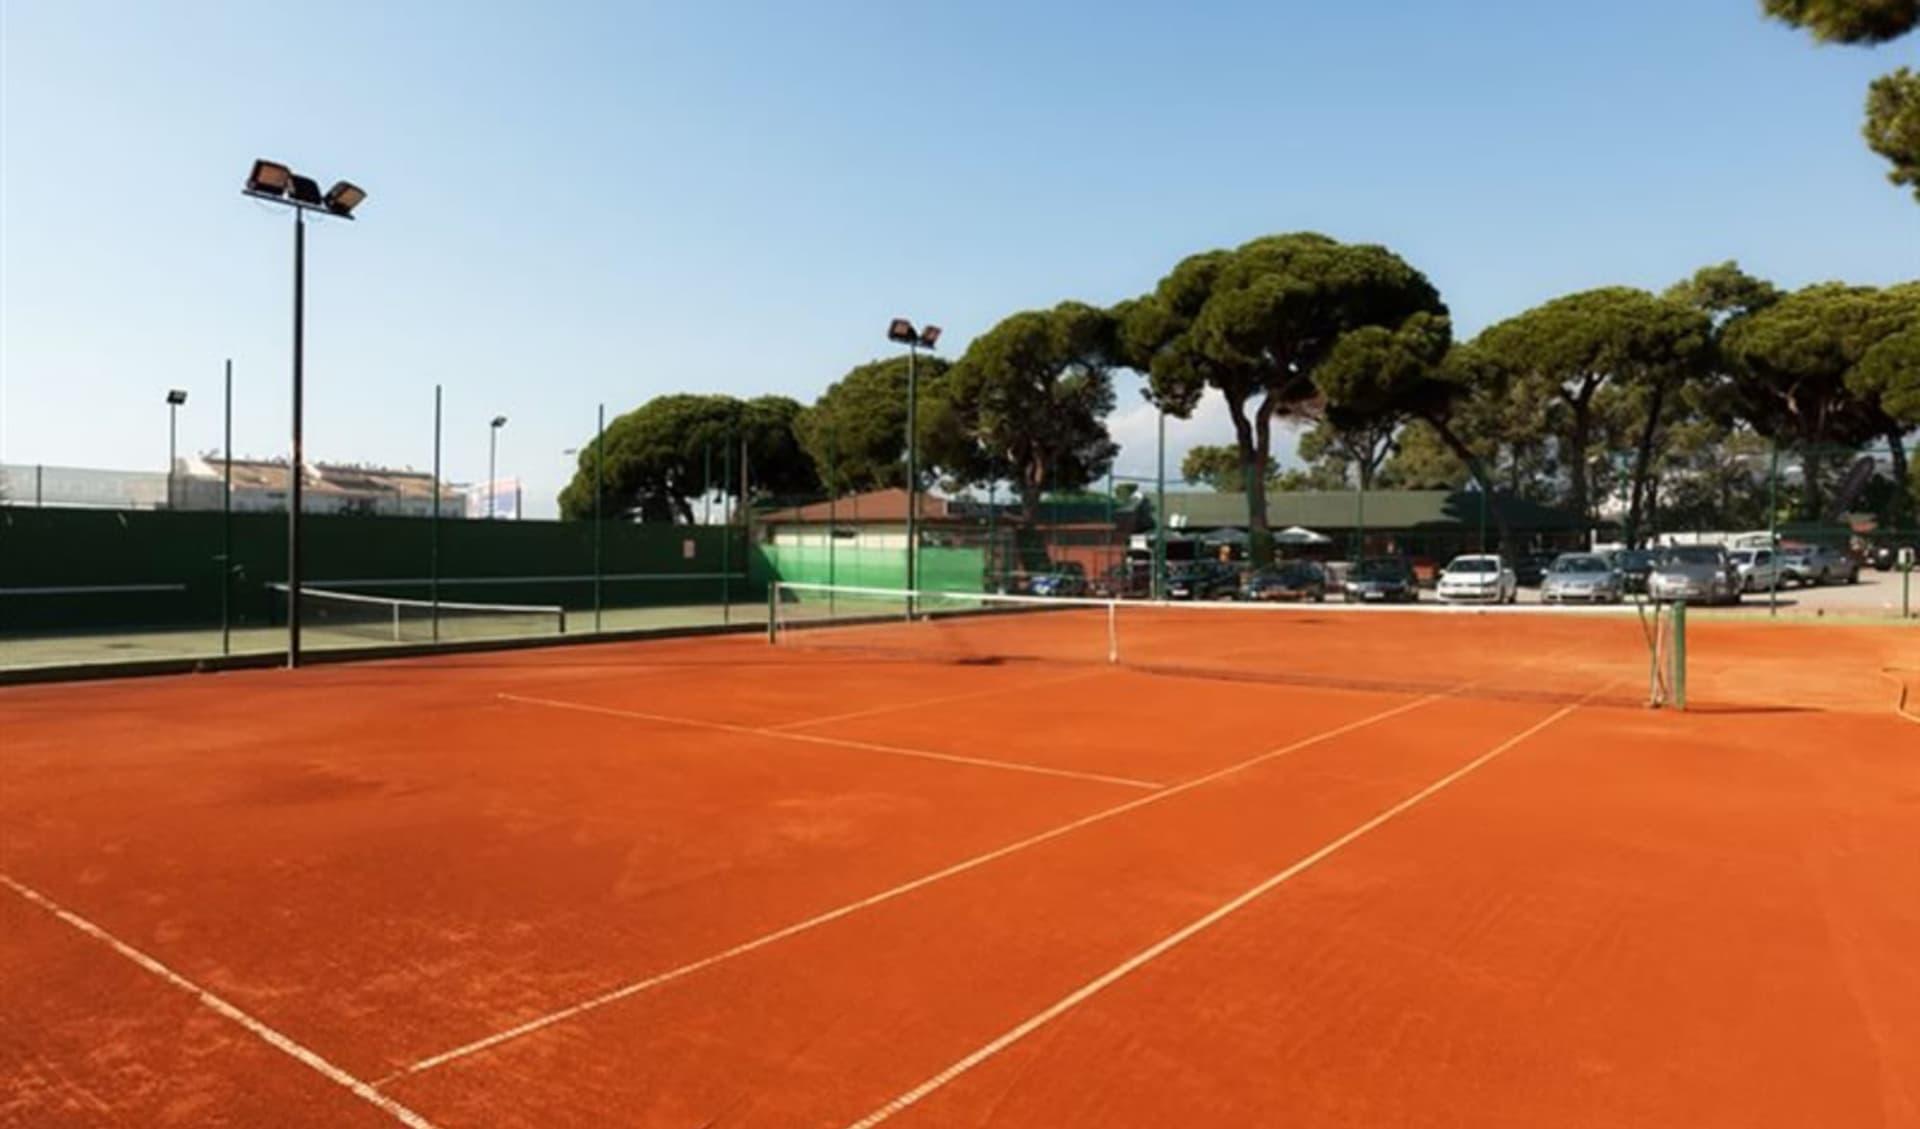 Malaga - Royal Tennis Club: trainingscamp